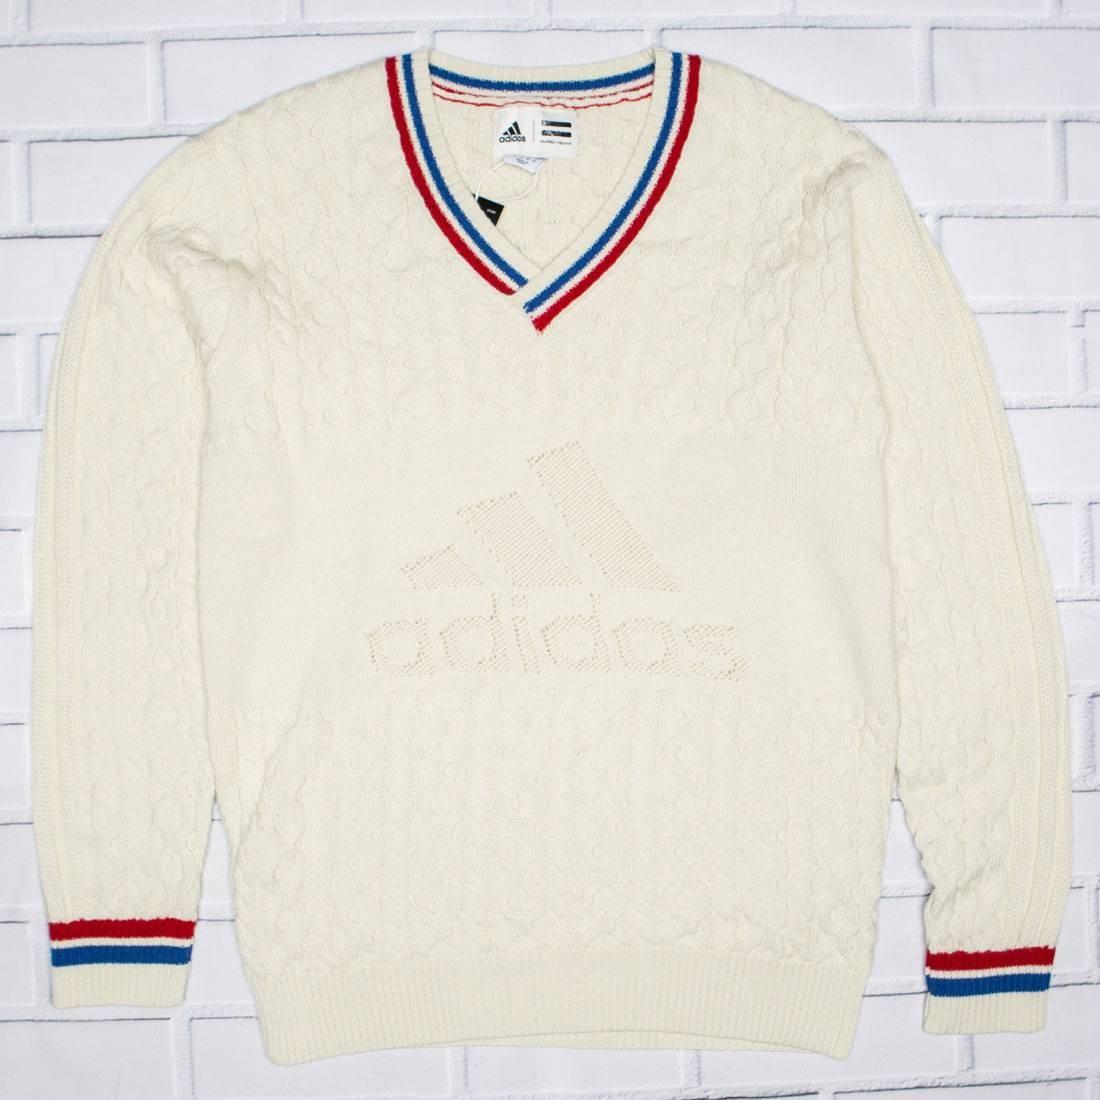 Adidas x Pharrell Williams Men NY Cable V-Neck Sweater (white / chalk white / blue / scarlet)